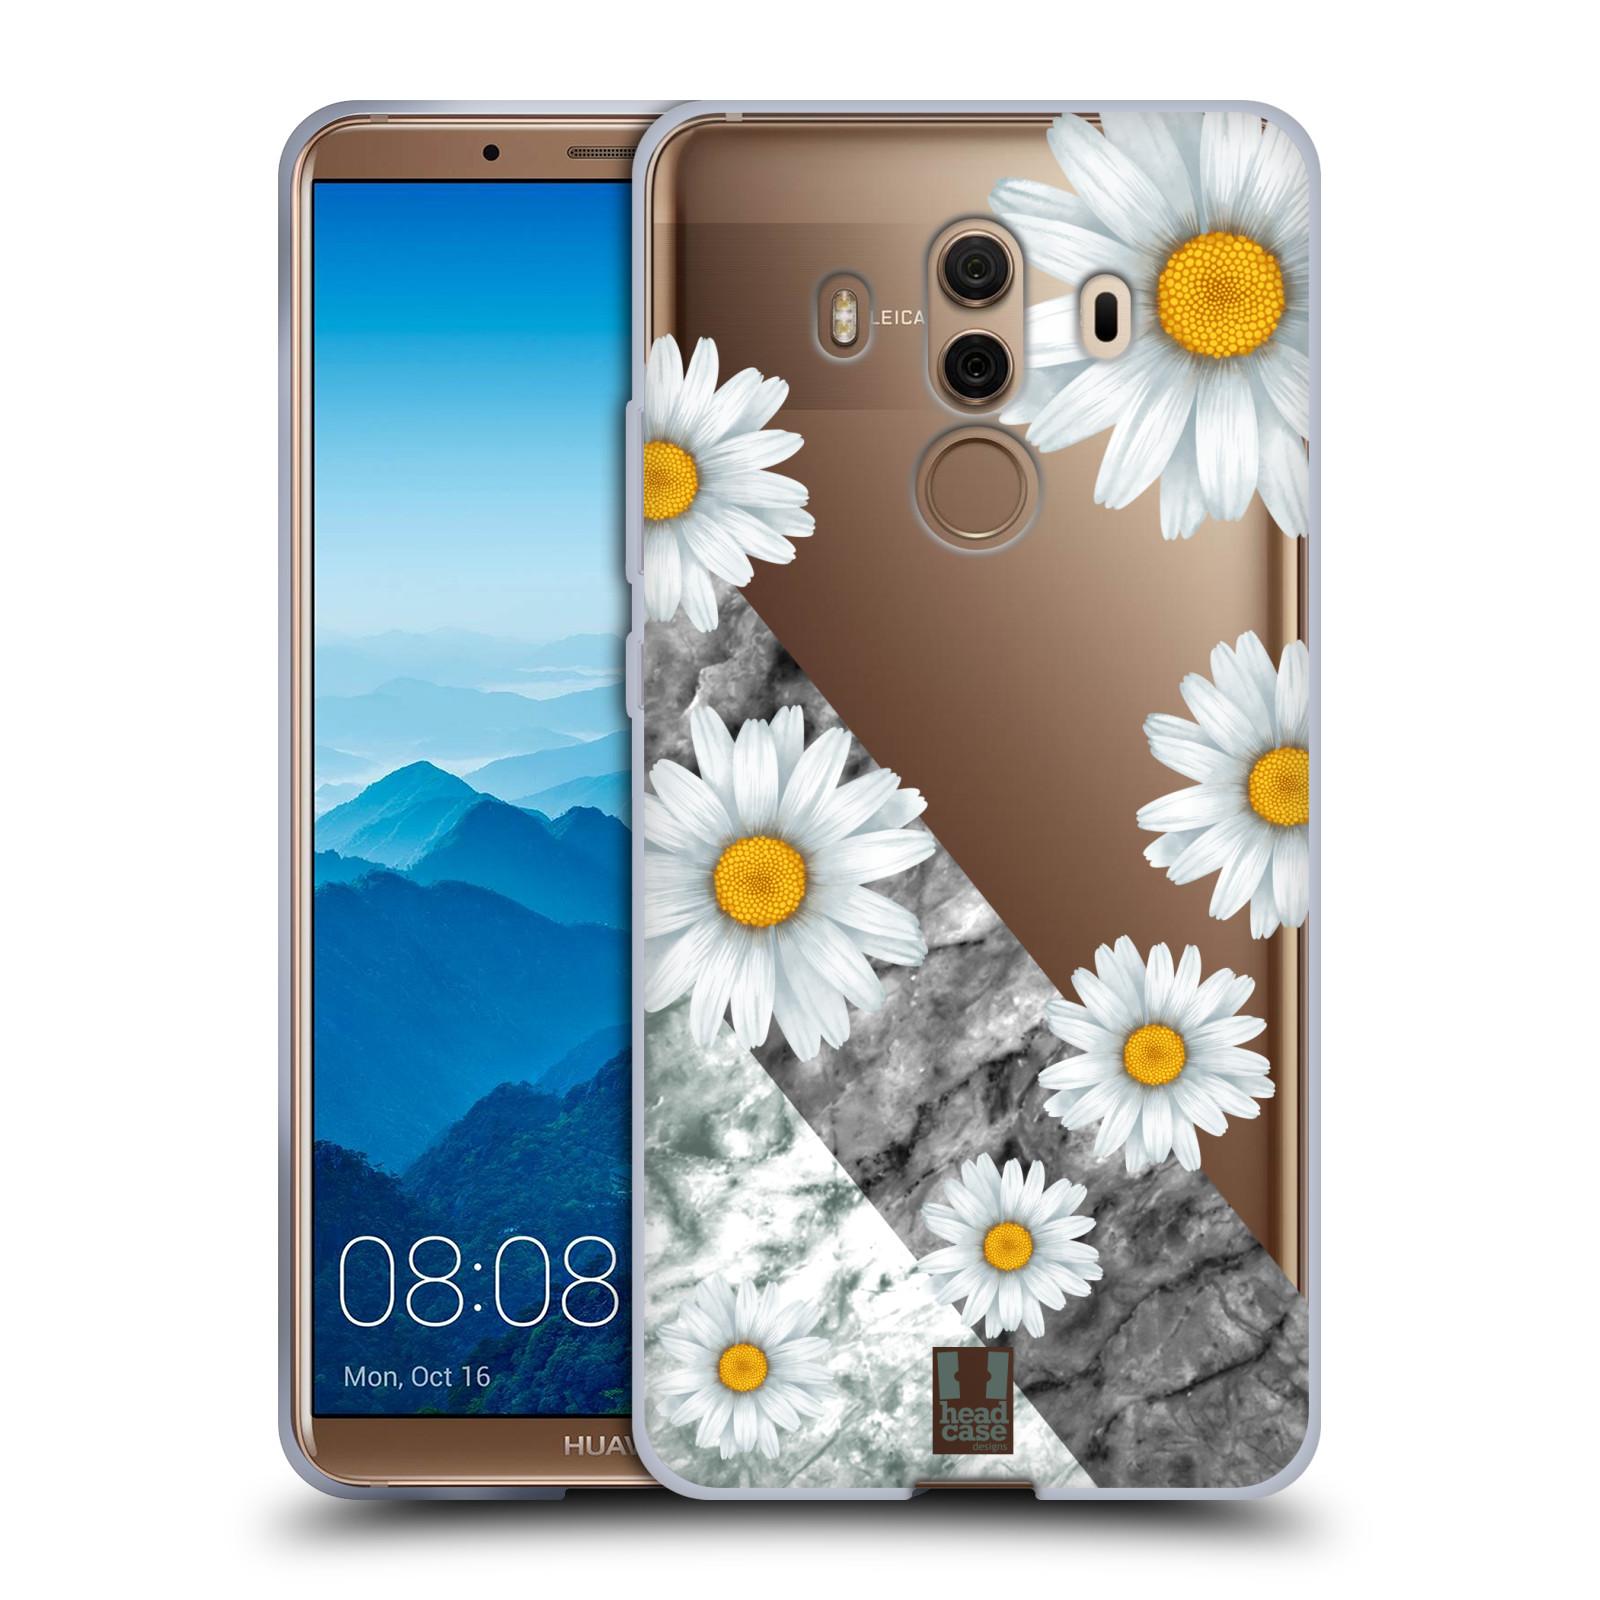 Silikonové pouzdro na mobil Huawei Mate 10 Pro - Head Case - Kopretiny a mramor